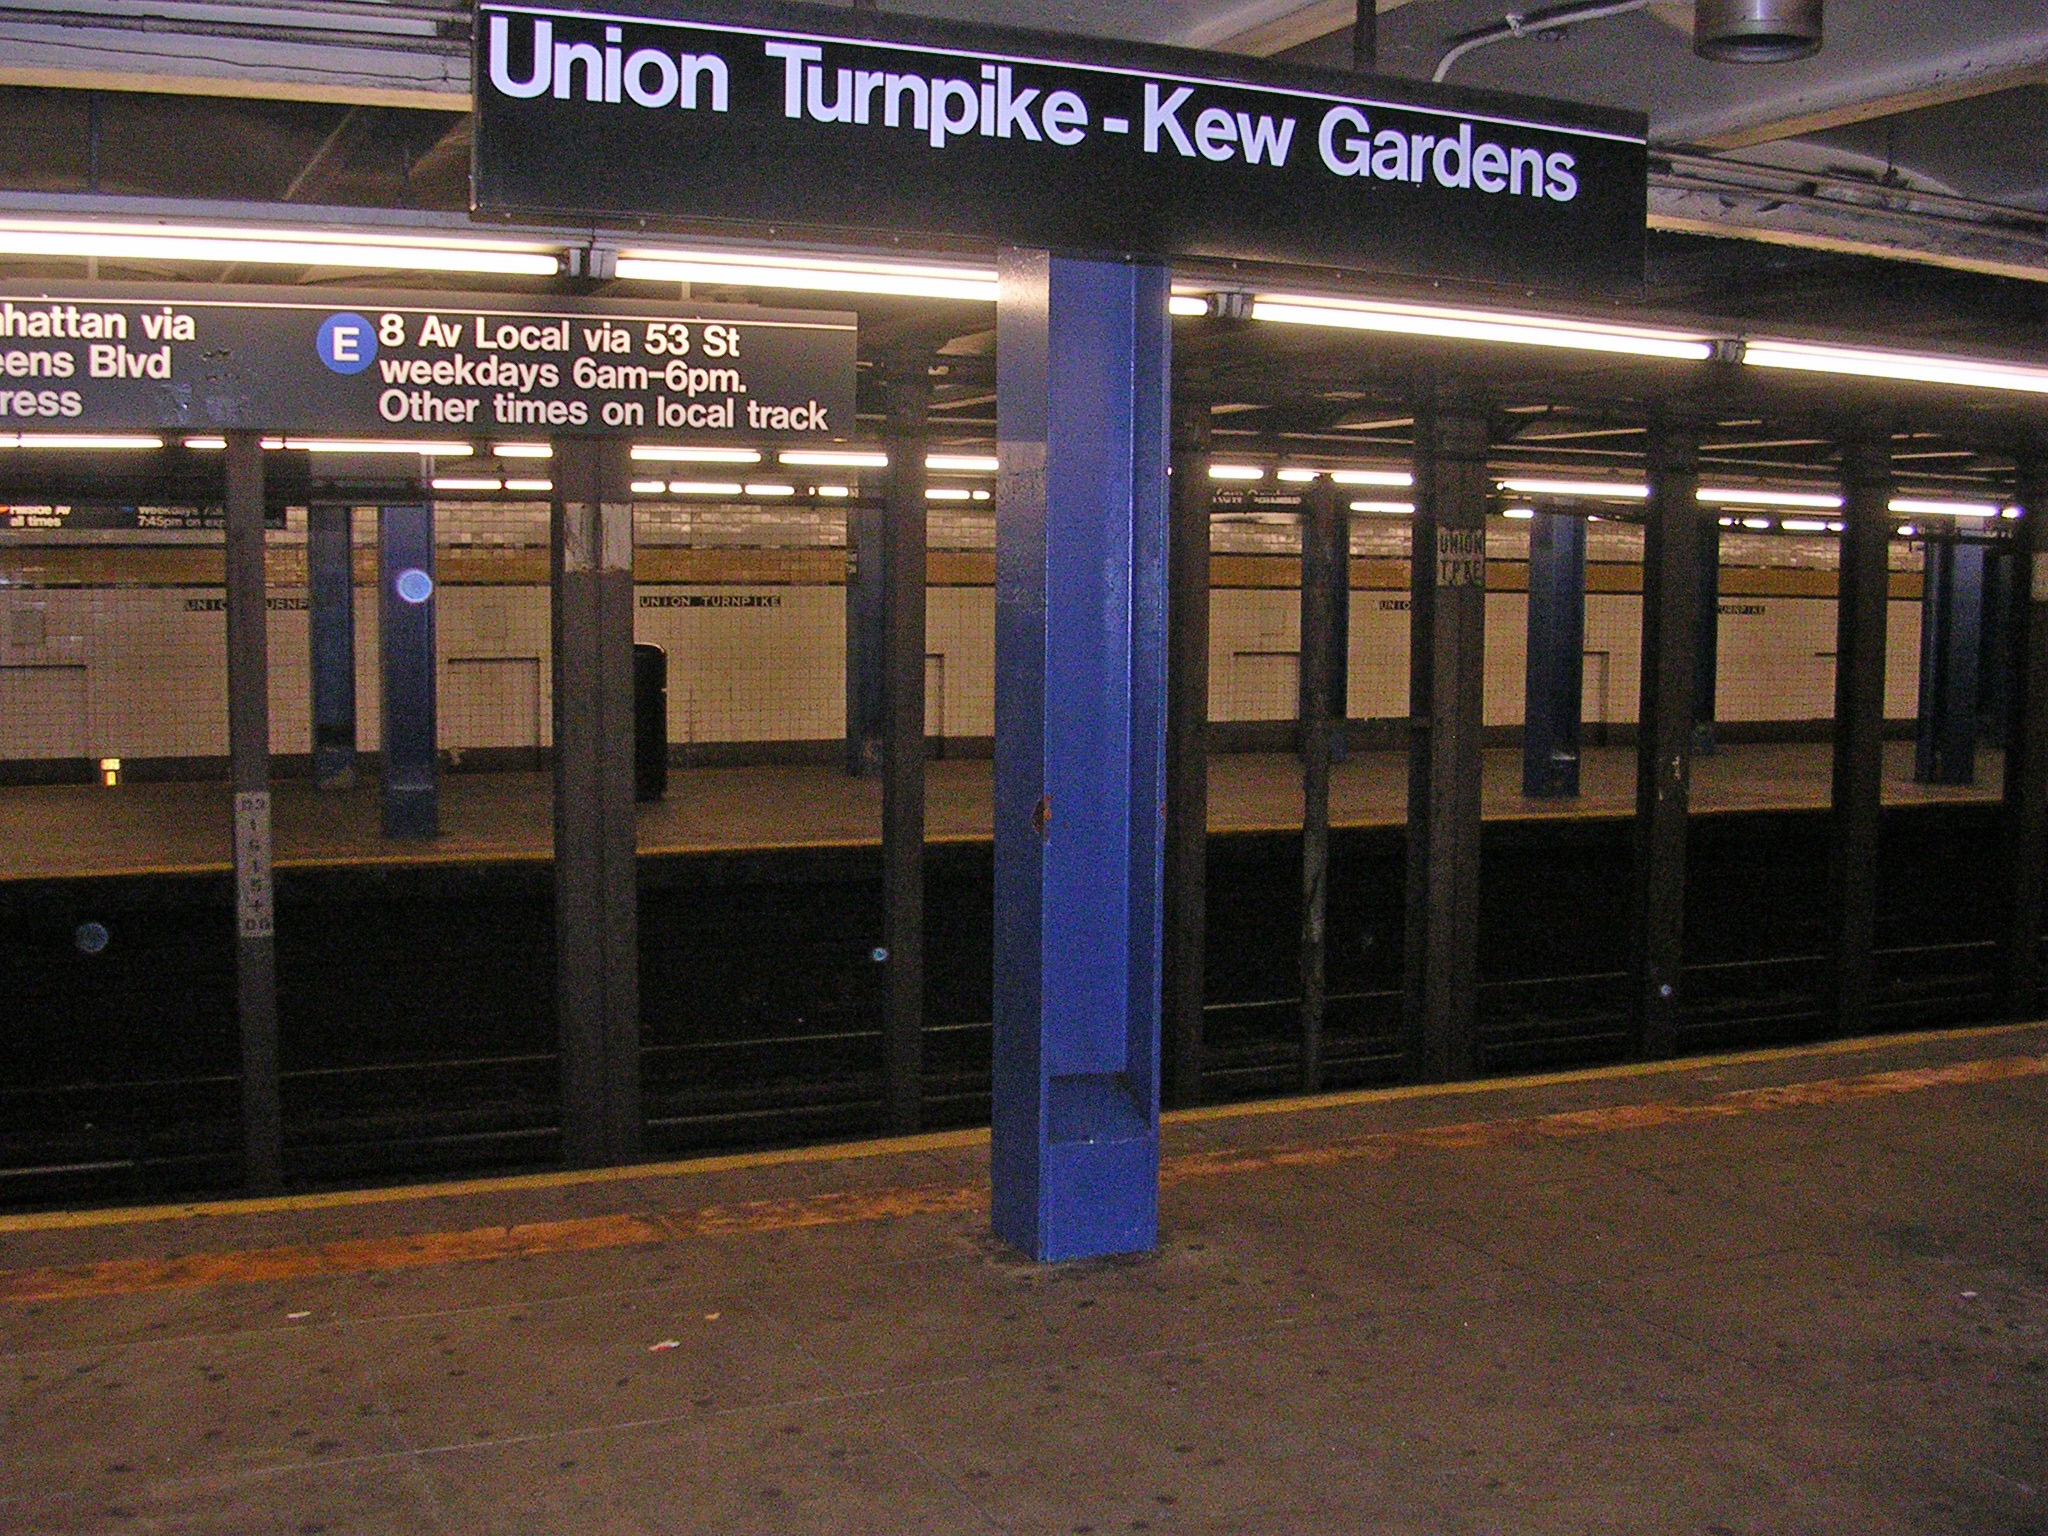 Union Turnpike Kew Gardens Station by David Shankbone - Kew Gardens Union Turnpike Subway Stop